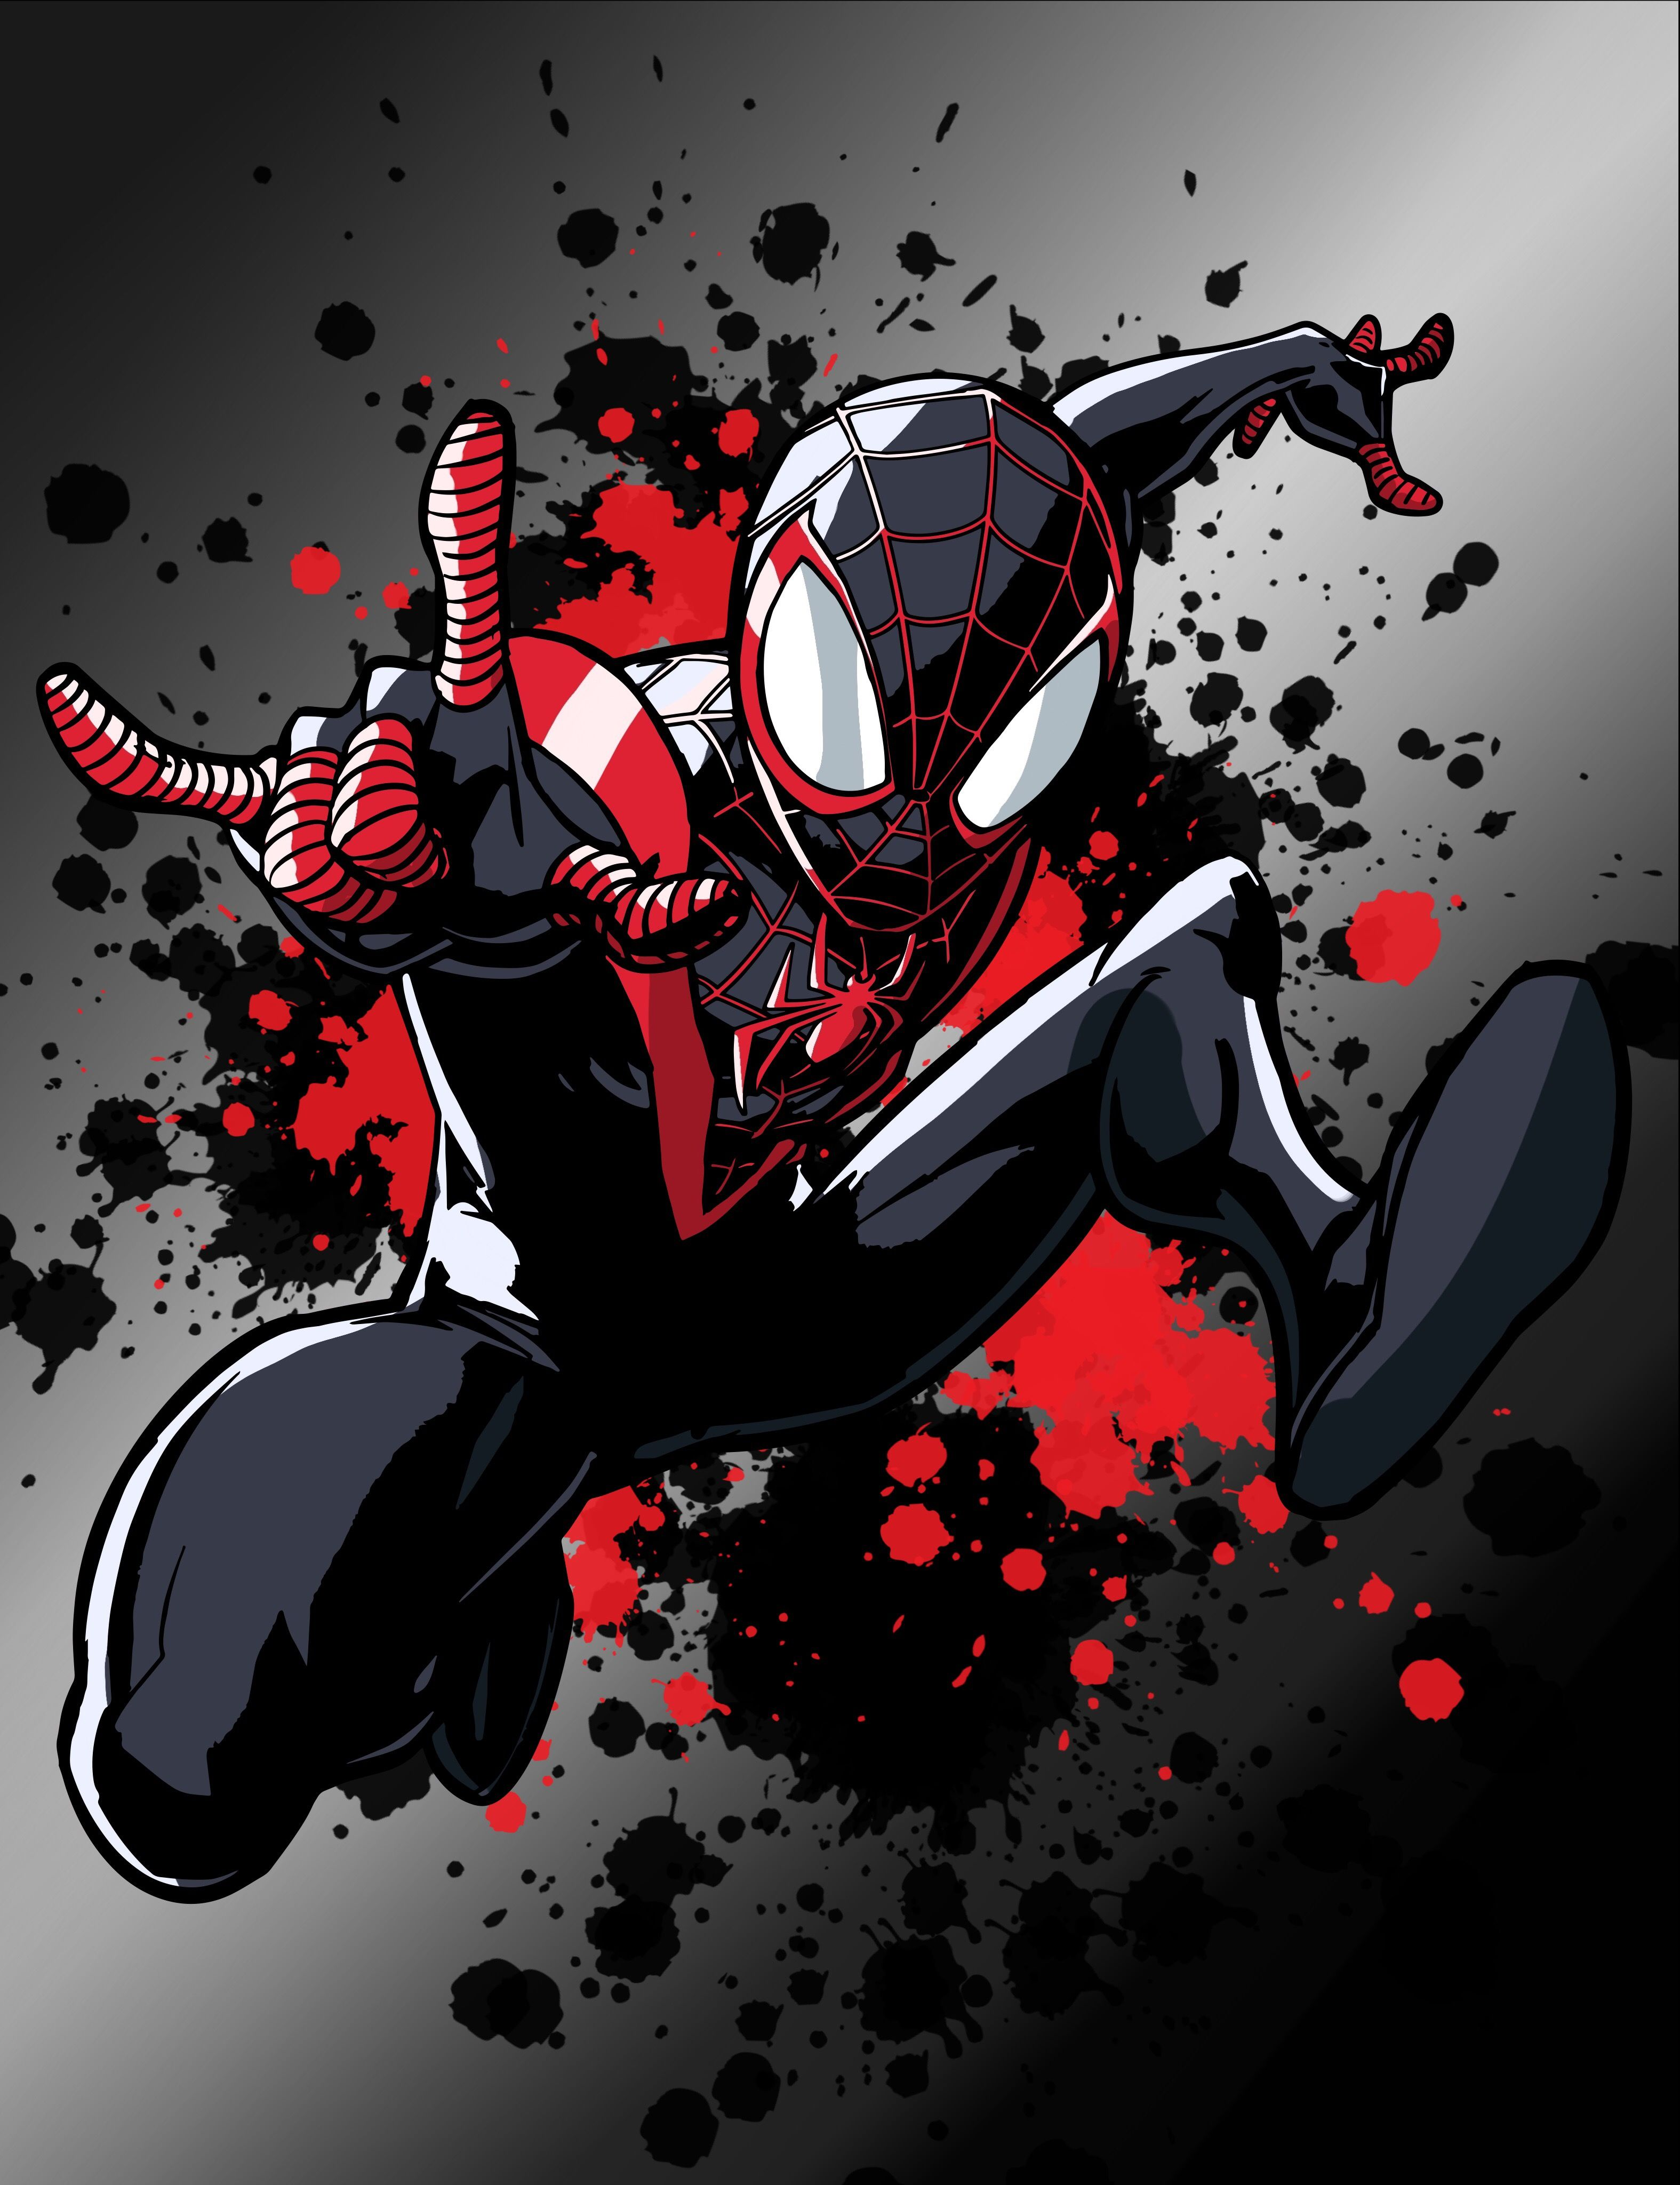 Miles Morales SpiderMan SpiderMan Into the Spider